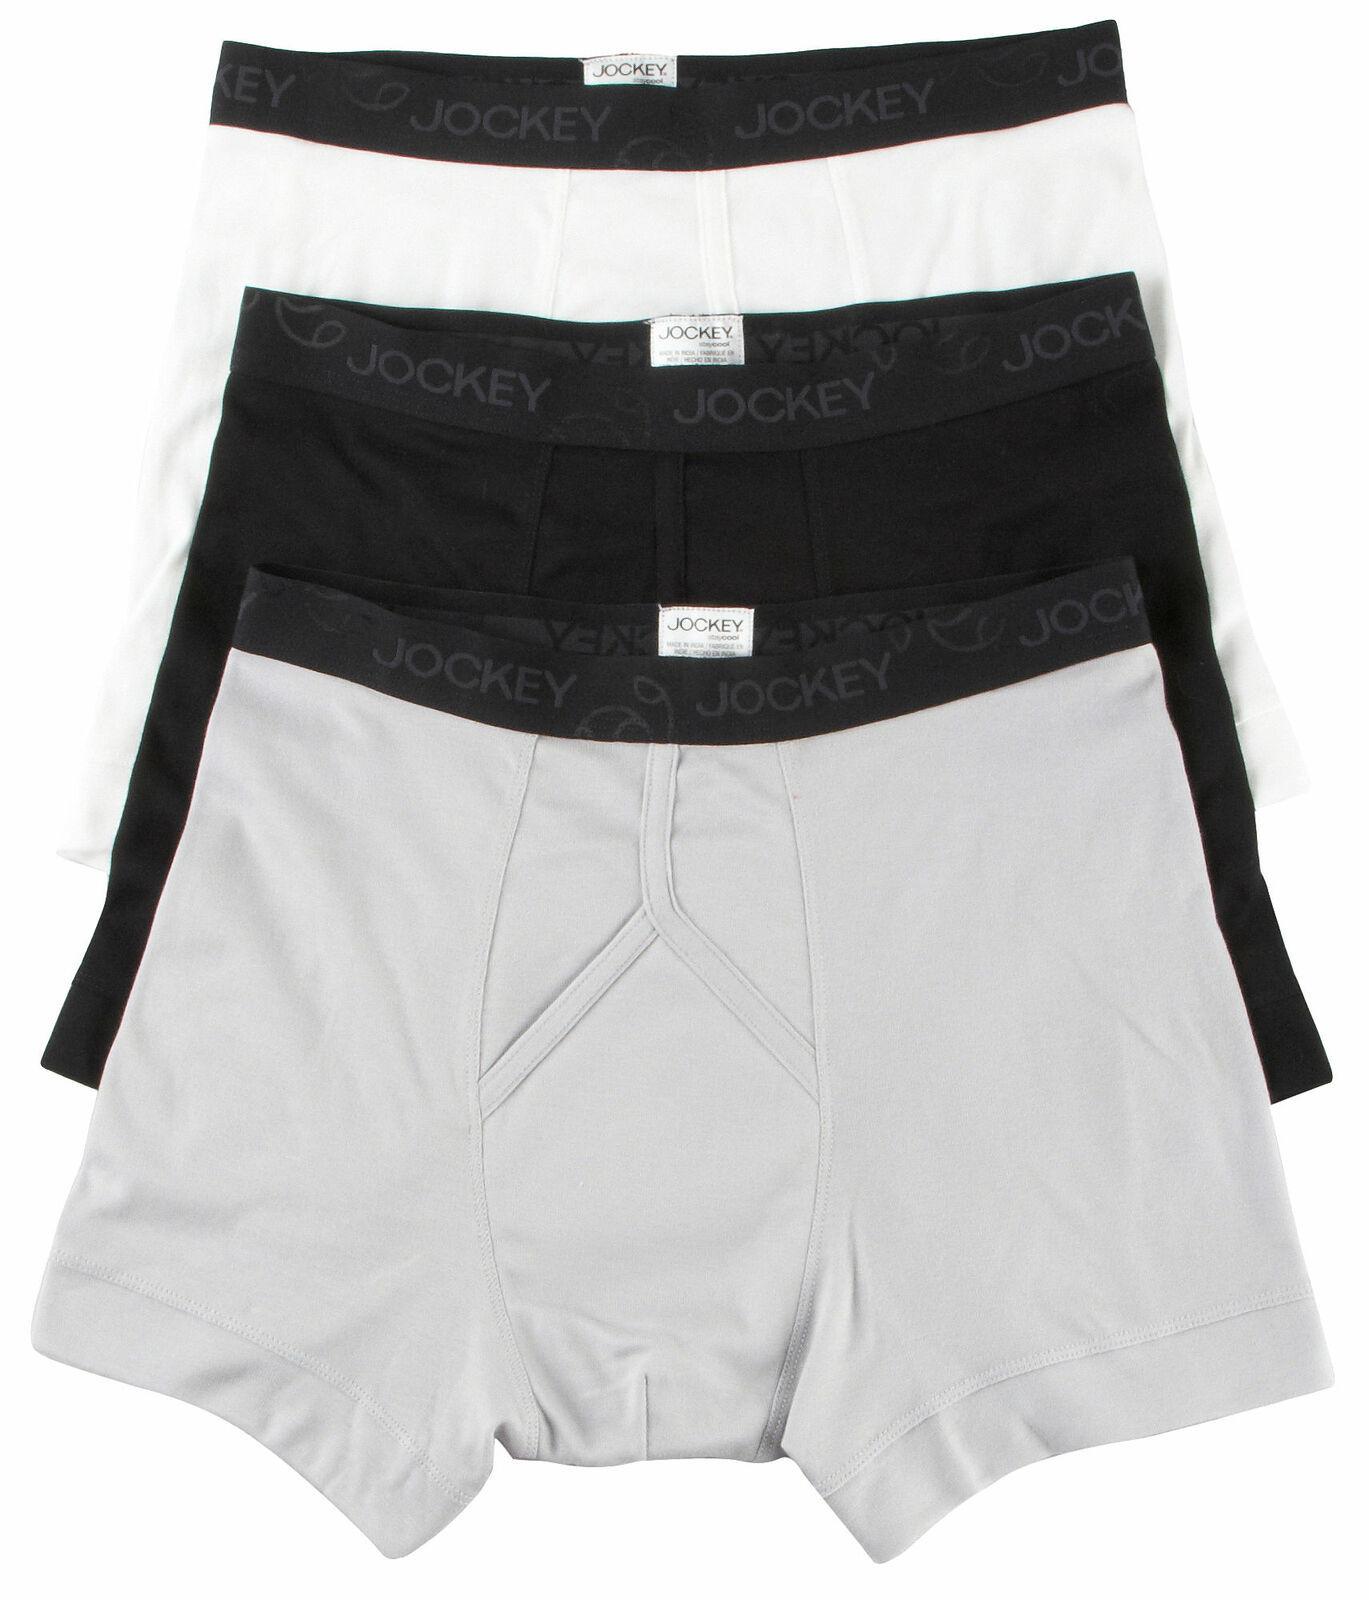 NEW Jockey 8802 Staycool Men's Classic Boxer Brief - 3 Pack S M L XL 100% Cotton